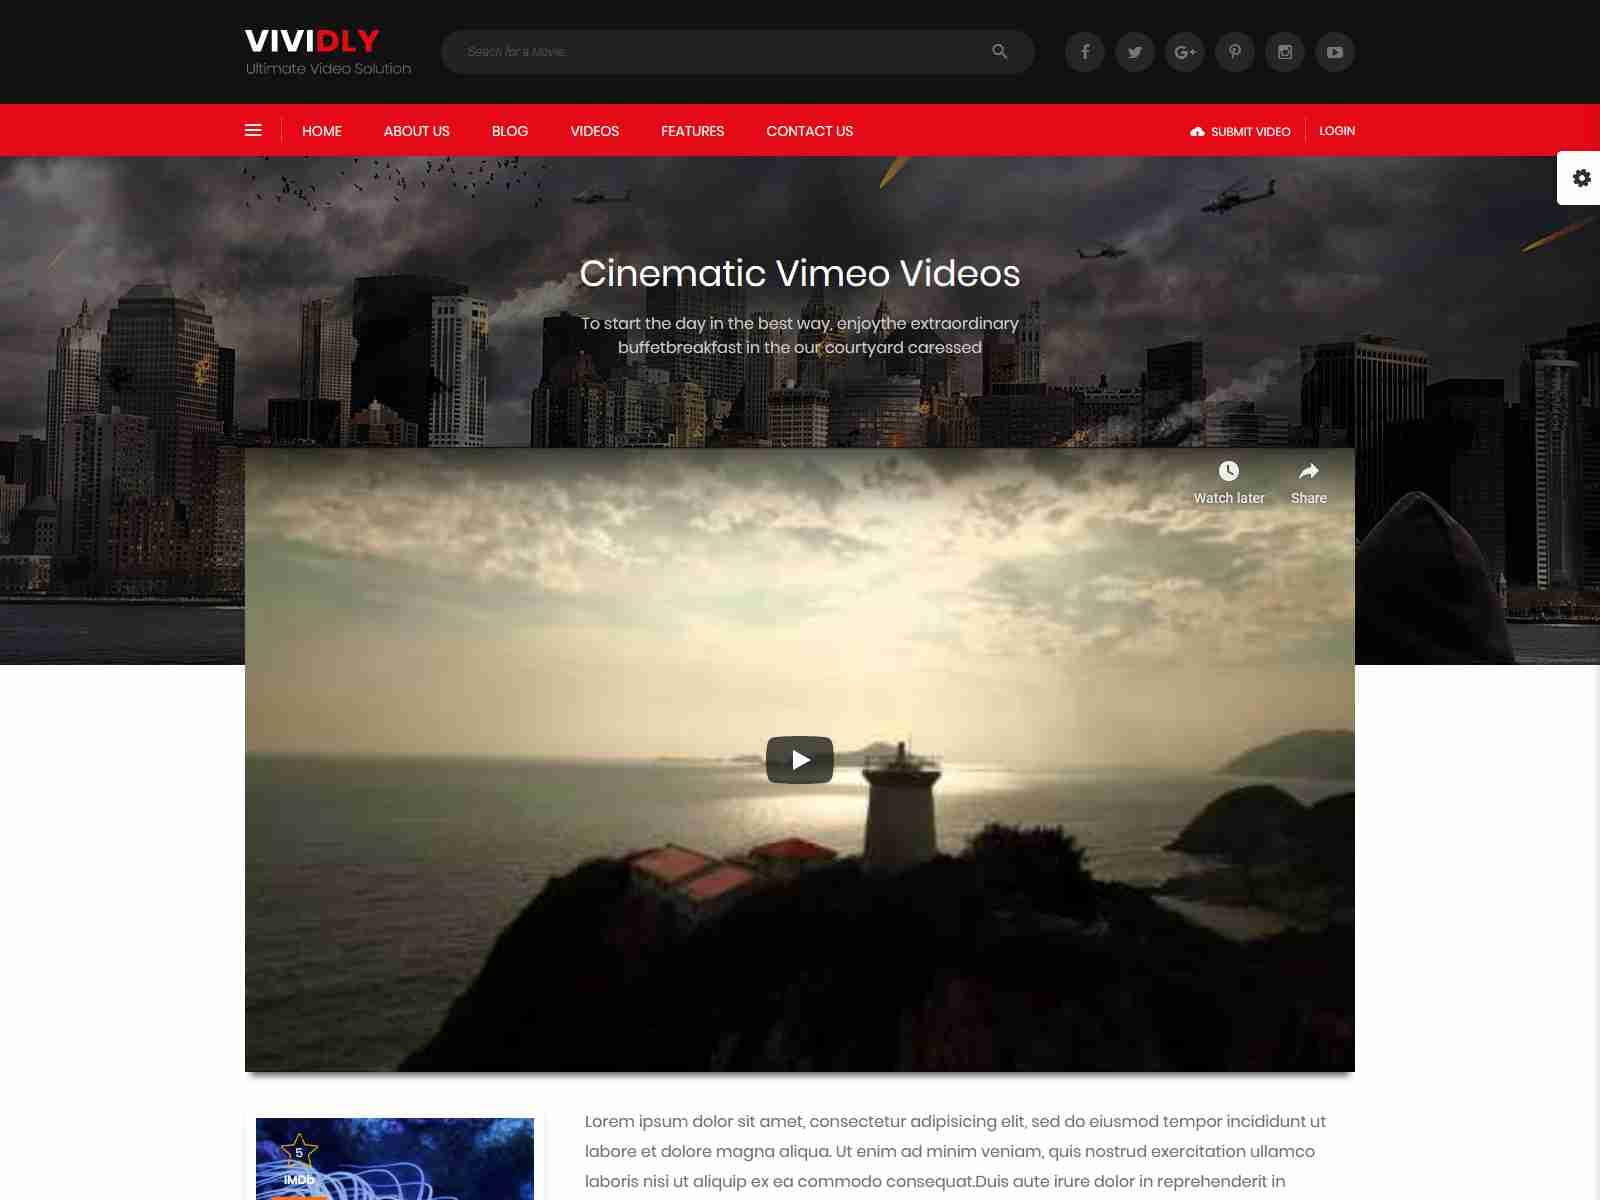 Vividly WP Blog Themes